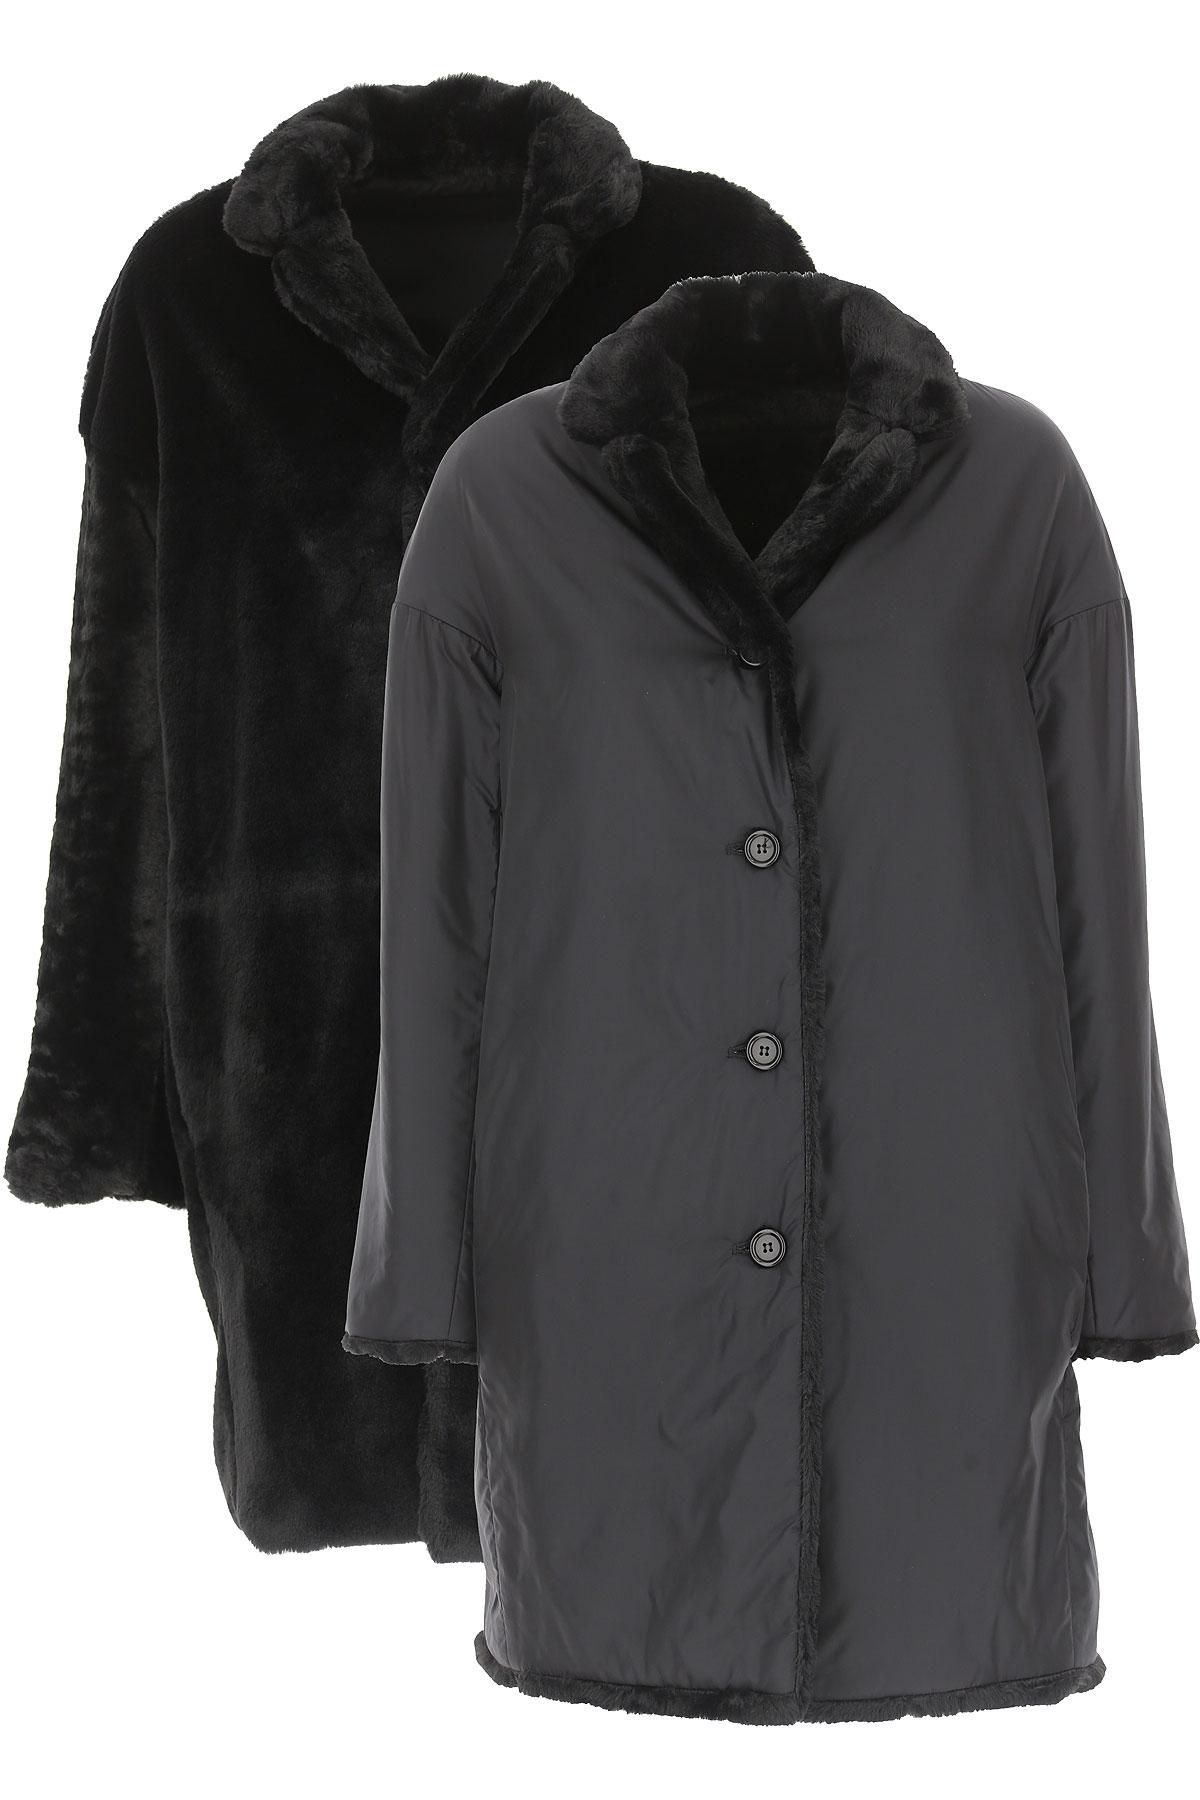 Aspesi Women's Coat On Sale, Black, polyamide, 2019, 10 4 6 8